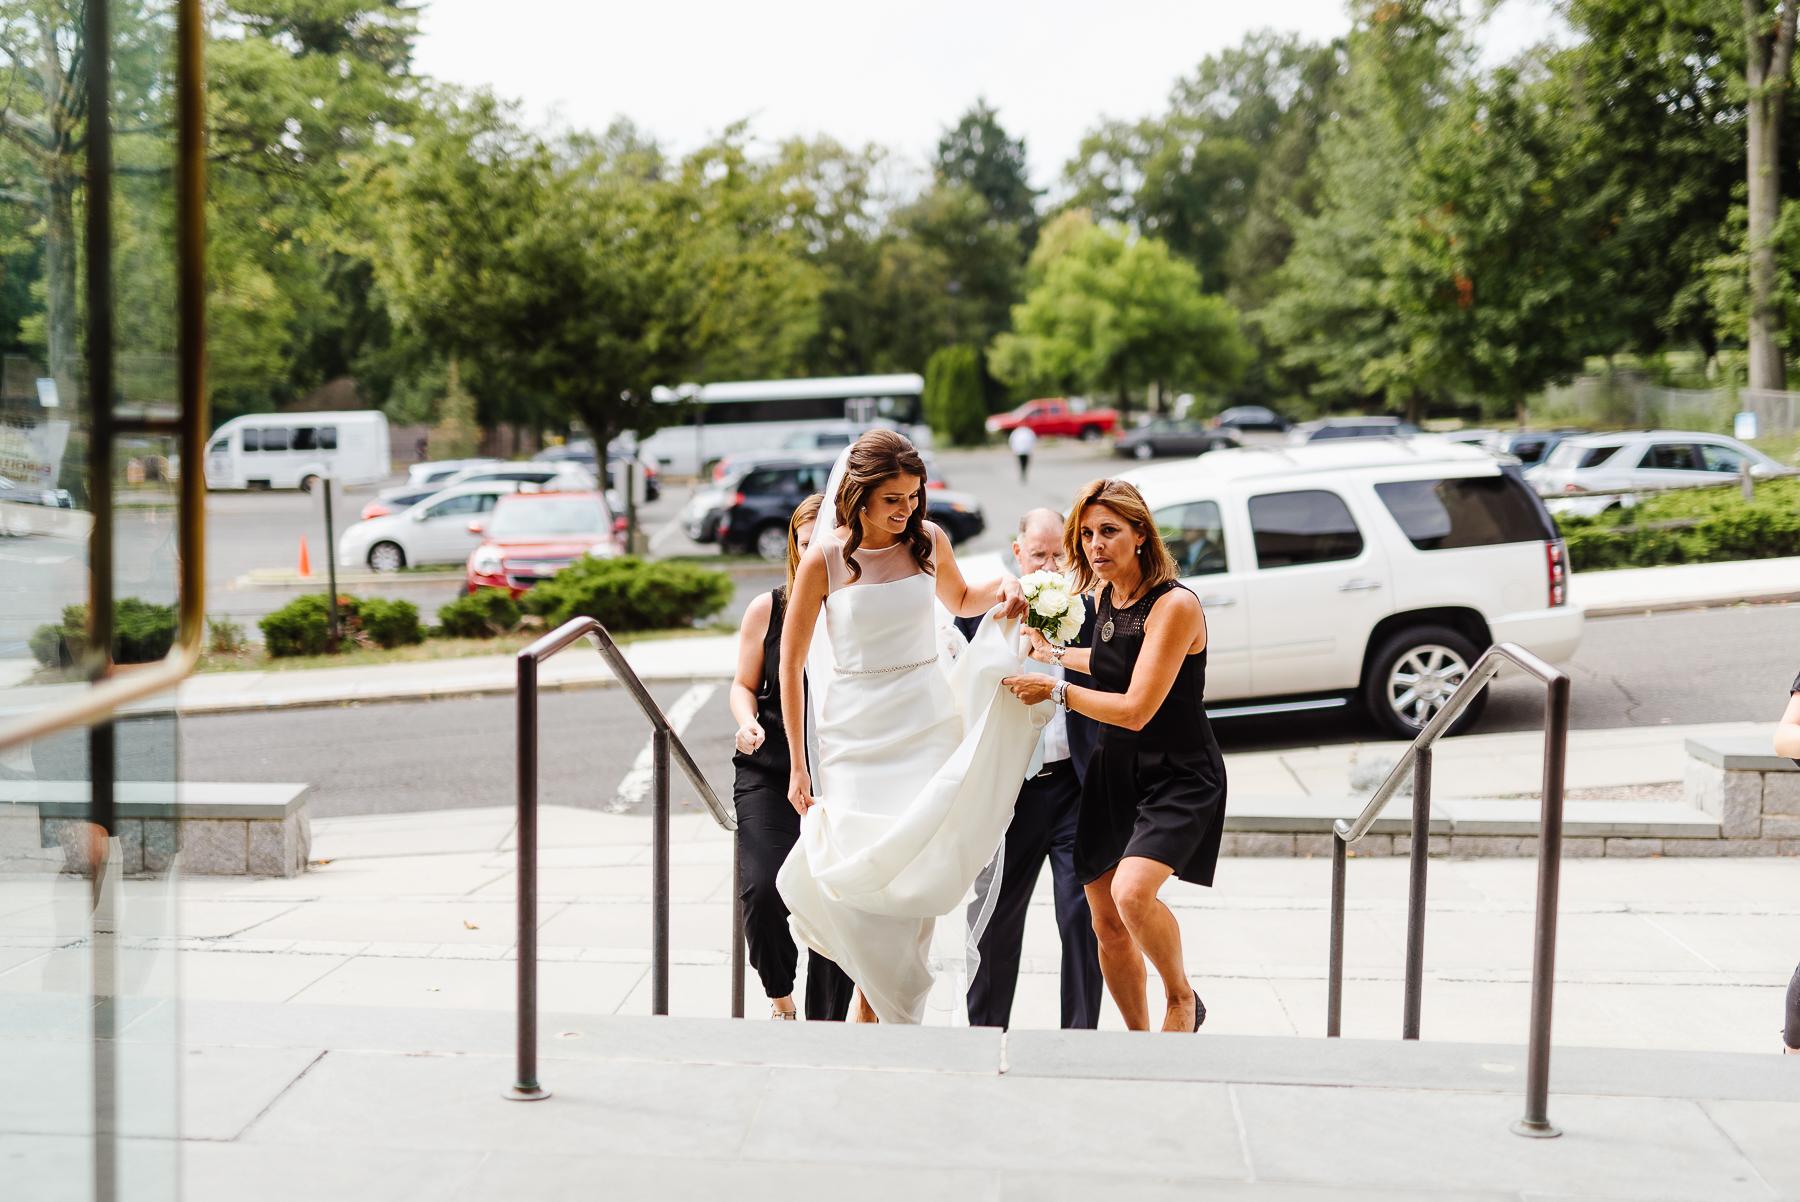 36-J Crew Wedding New Jersey Wedding Photographer J Crew Weddings.jpg